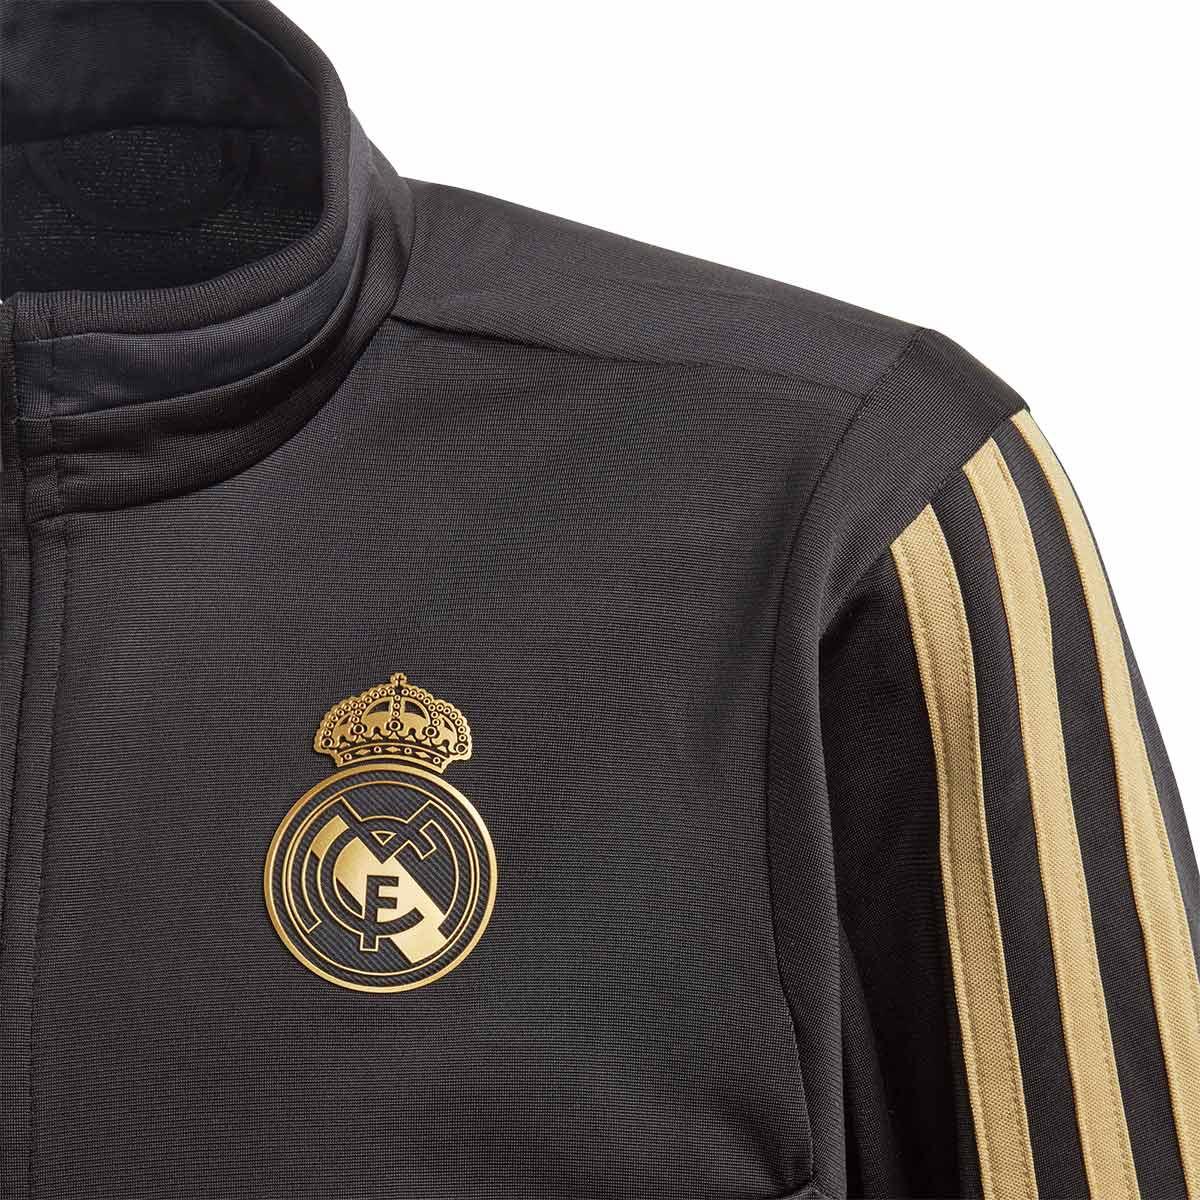 apelación Invalidez Melodrama  Chándal adidas Real Madrid PES 2019-2020 Niño Black-Dark football gold -  Tienda de fútbol Fútbol Emotion